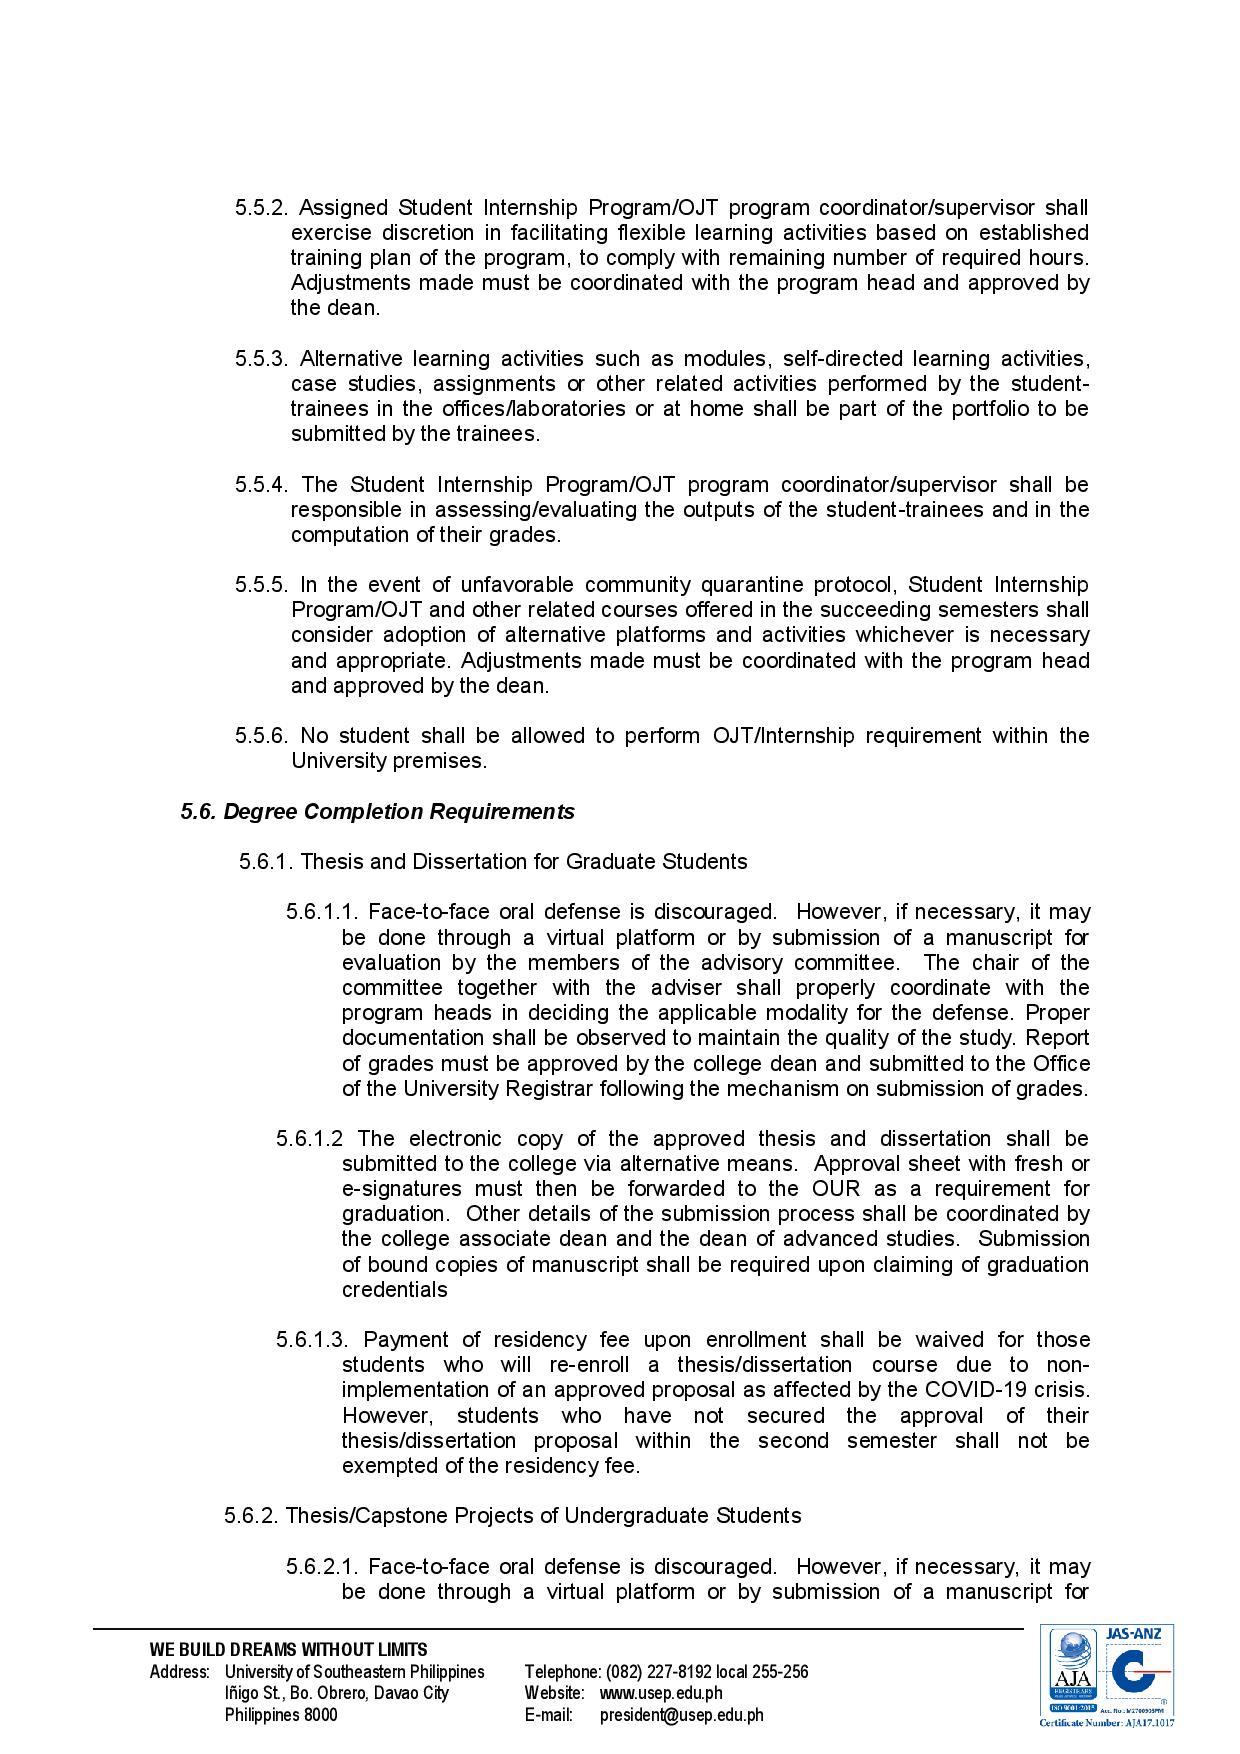 mc-02-s-2020-memorandum-circular-on-usep-academic-regulations-amidst-the-covid-19-pandemic-page-005